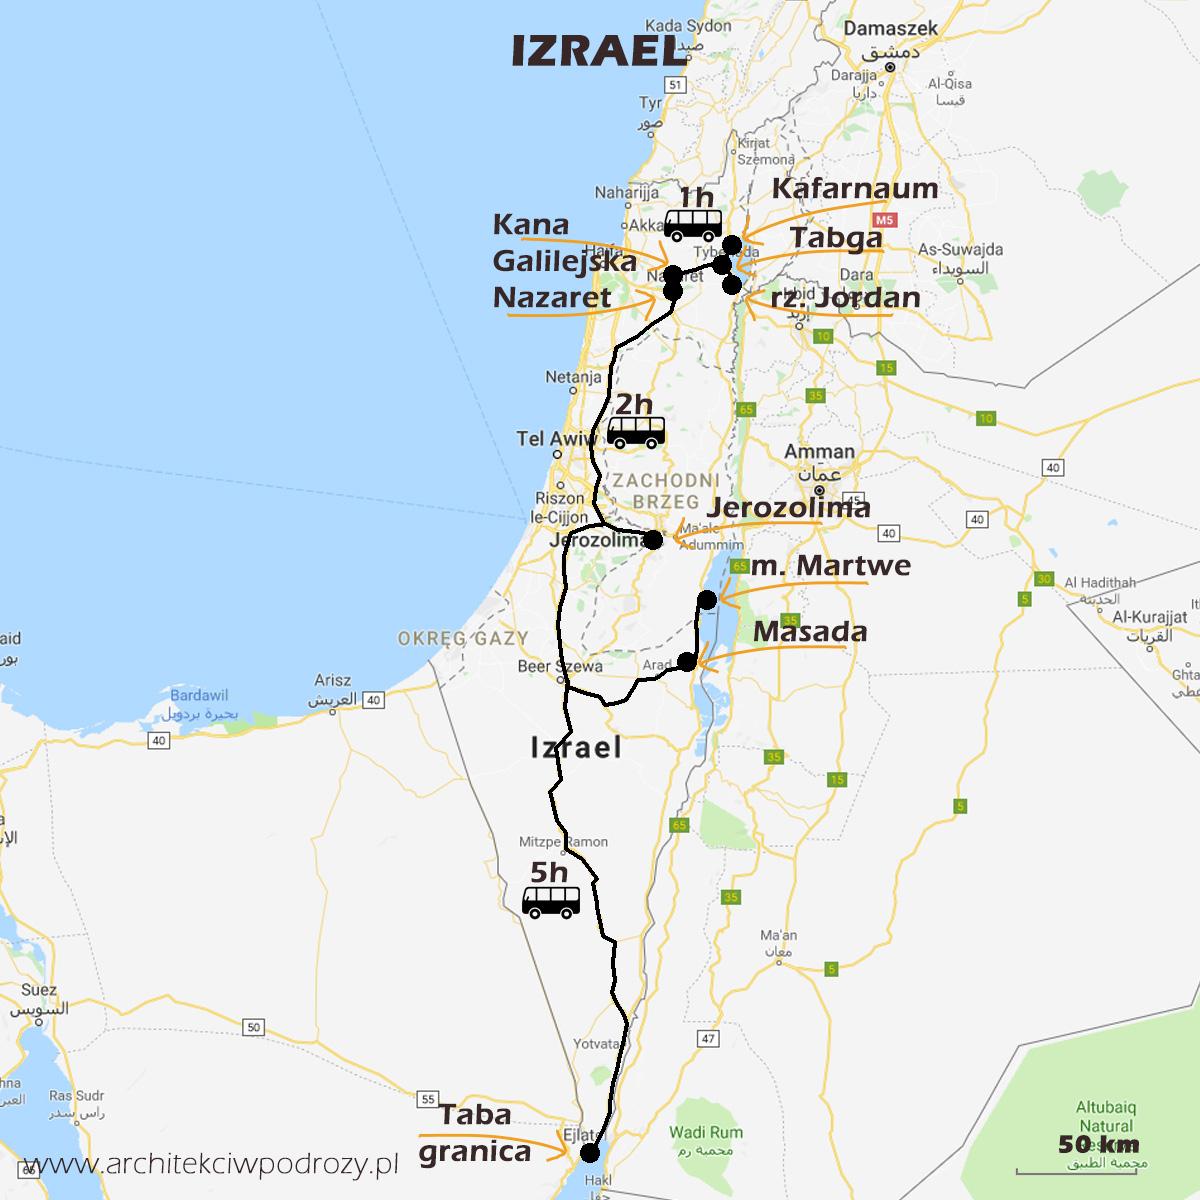 01 IZRAEL mapa - Izrael